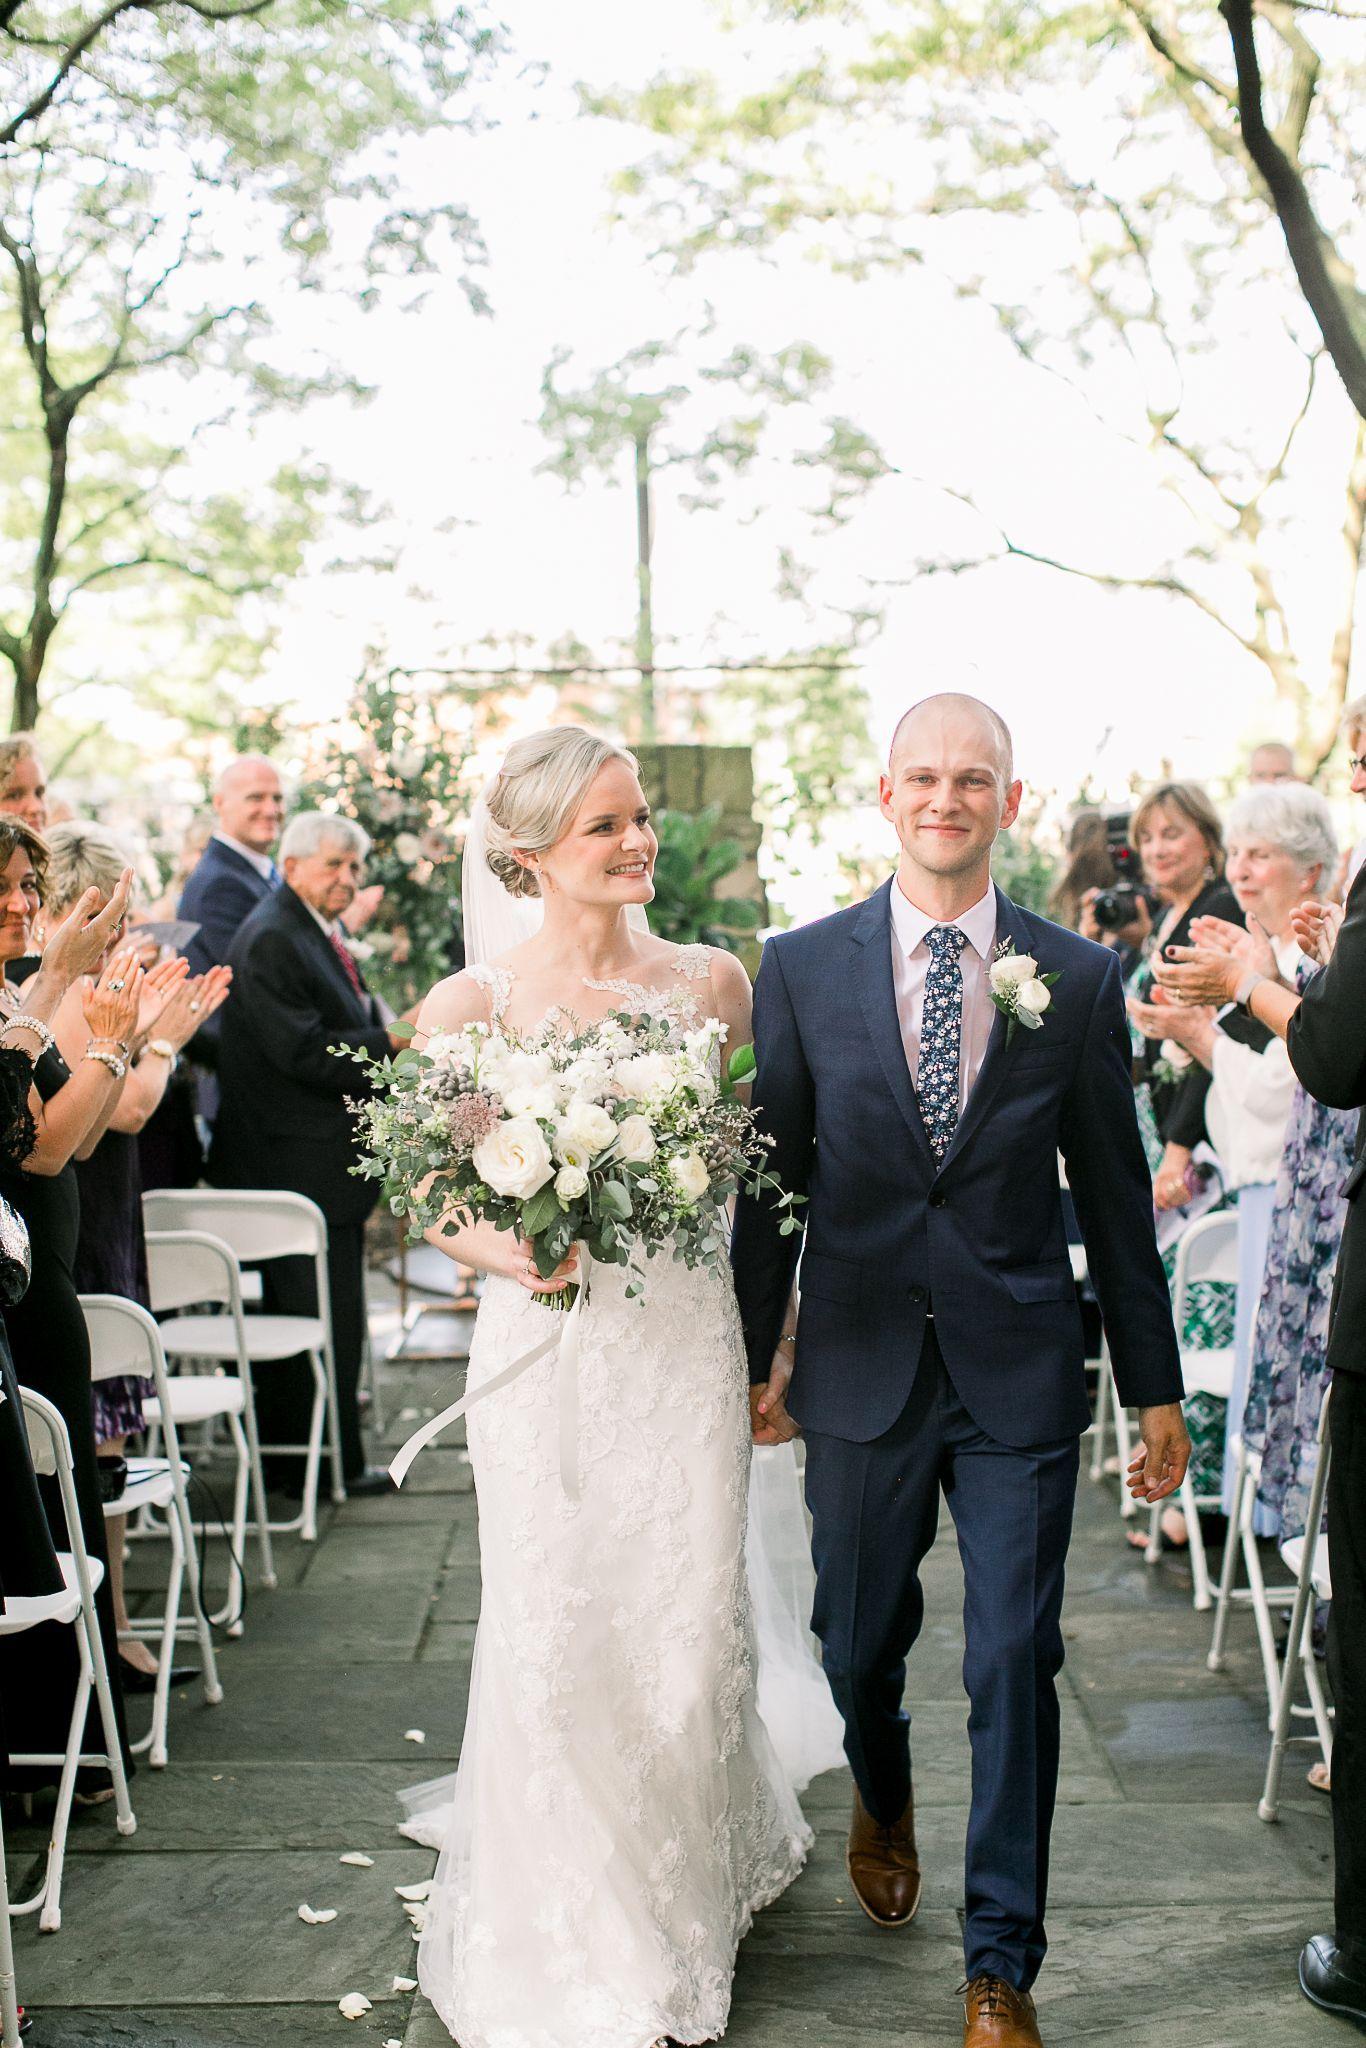 Wedding Ceremony At St Joseph S Park Rochester Ny In 2020 Ny Wedding Venues Ny Wedding Wedding Photographers